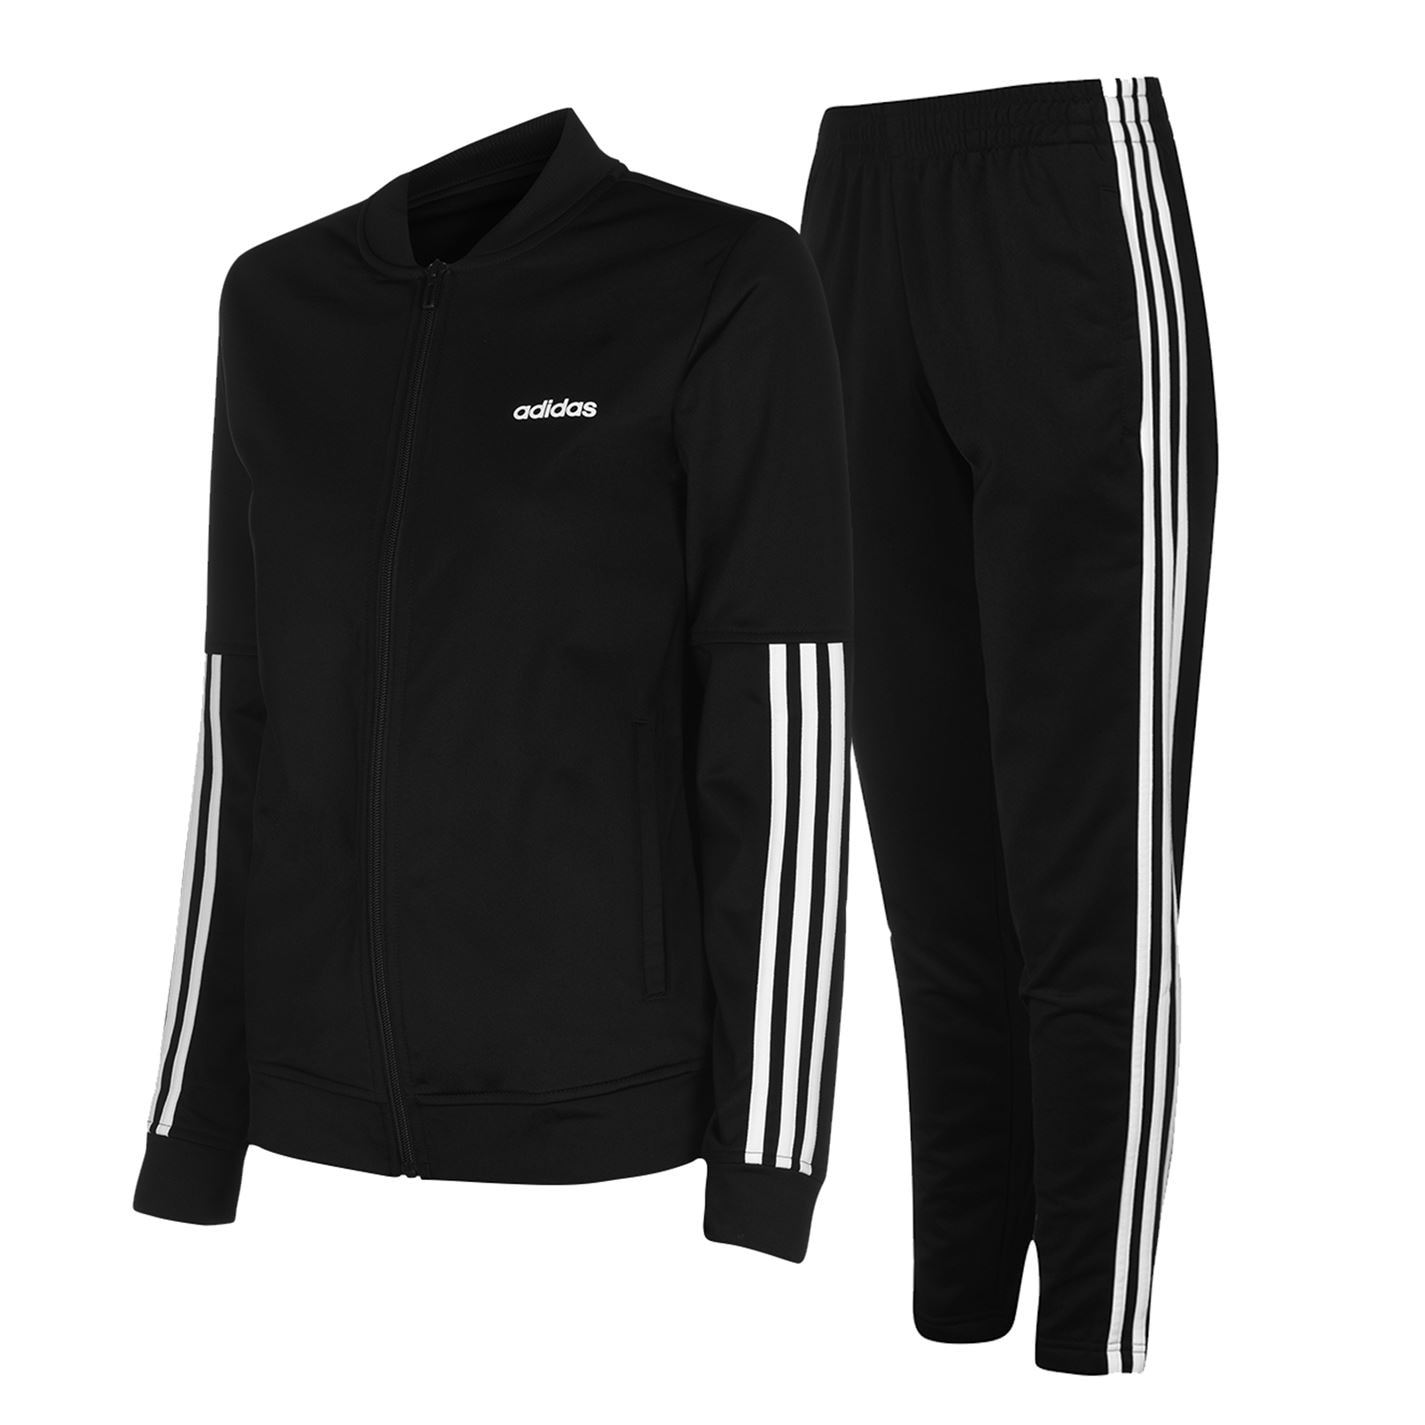 Sono depressi biologia spedizione  Adidas Back 2 Basics Set Tracksuit Womens Black/White Ladies Jacket Top  Bottoms | eBay